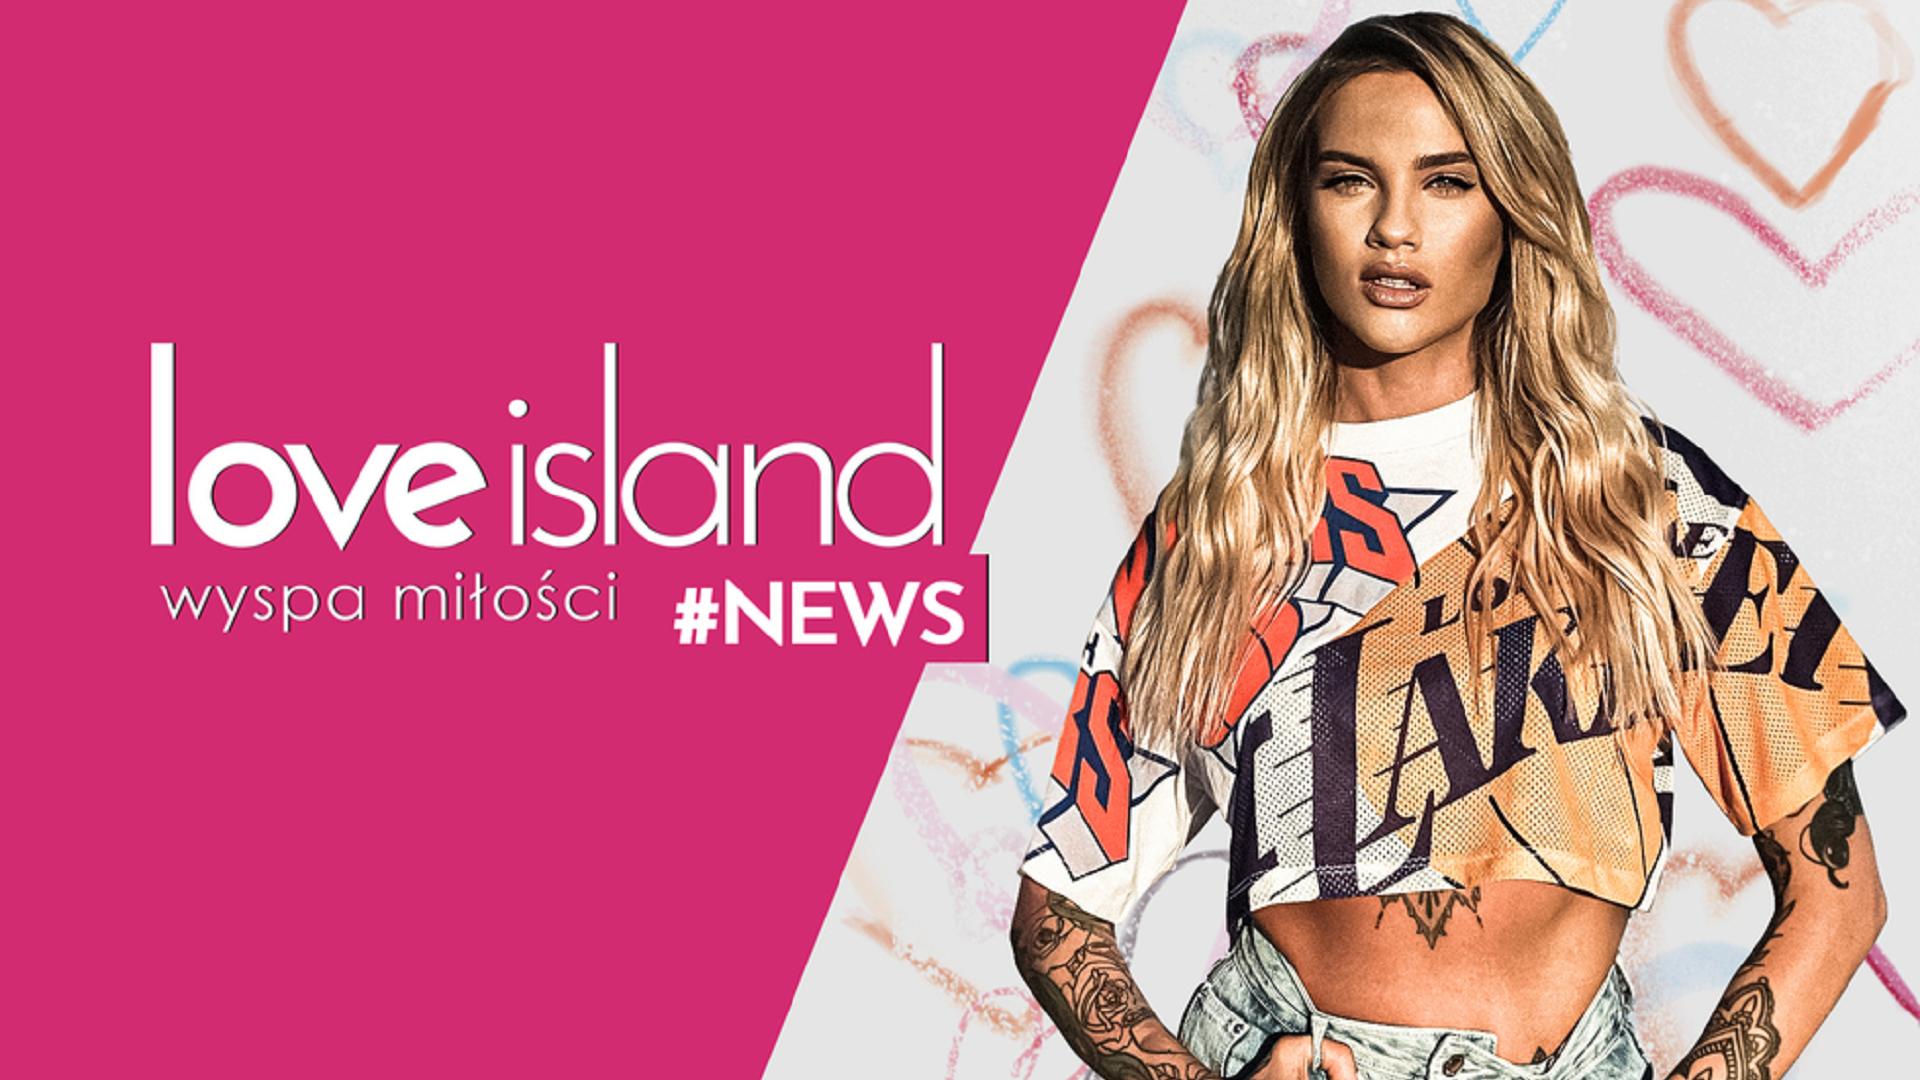 Love Island #NEWS - Odcinek 3